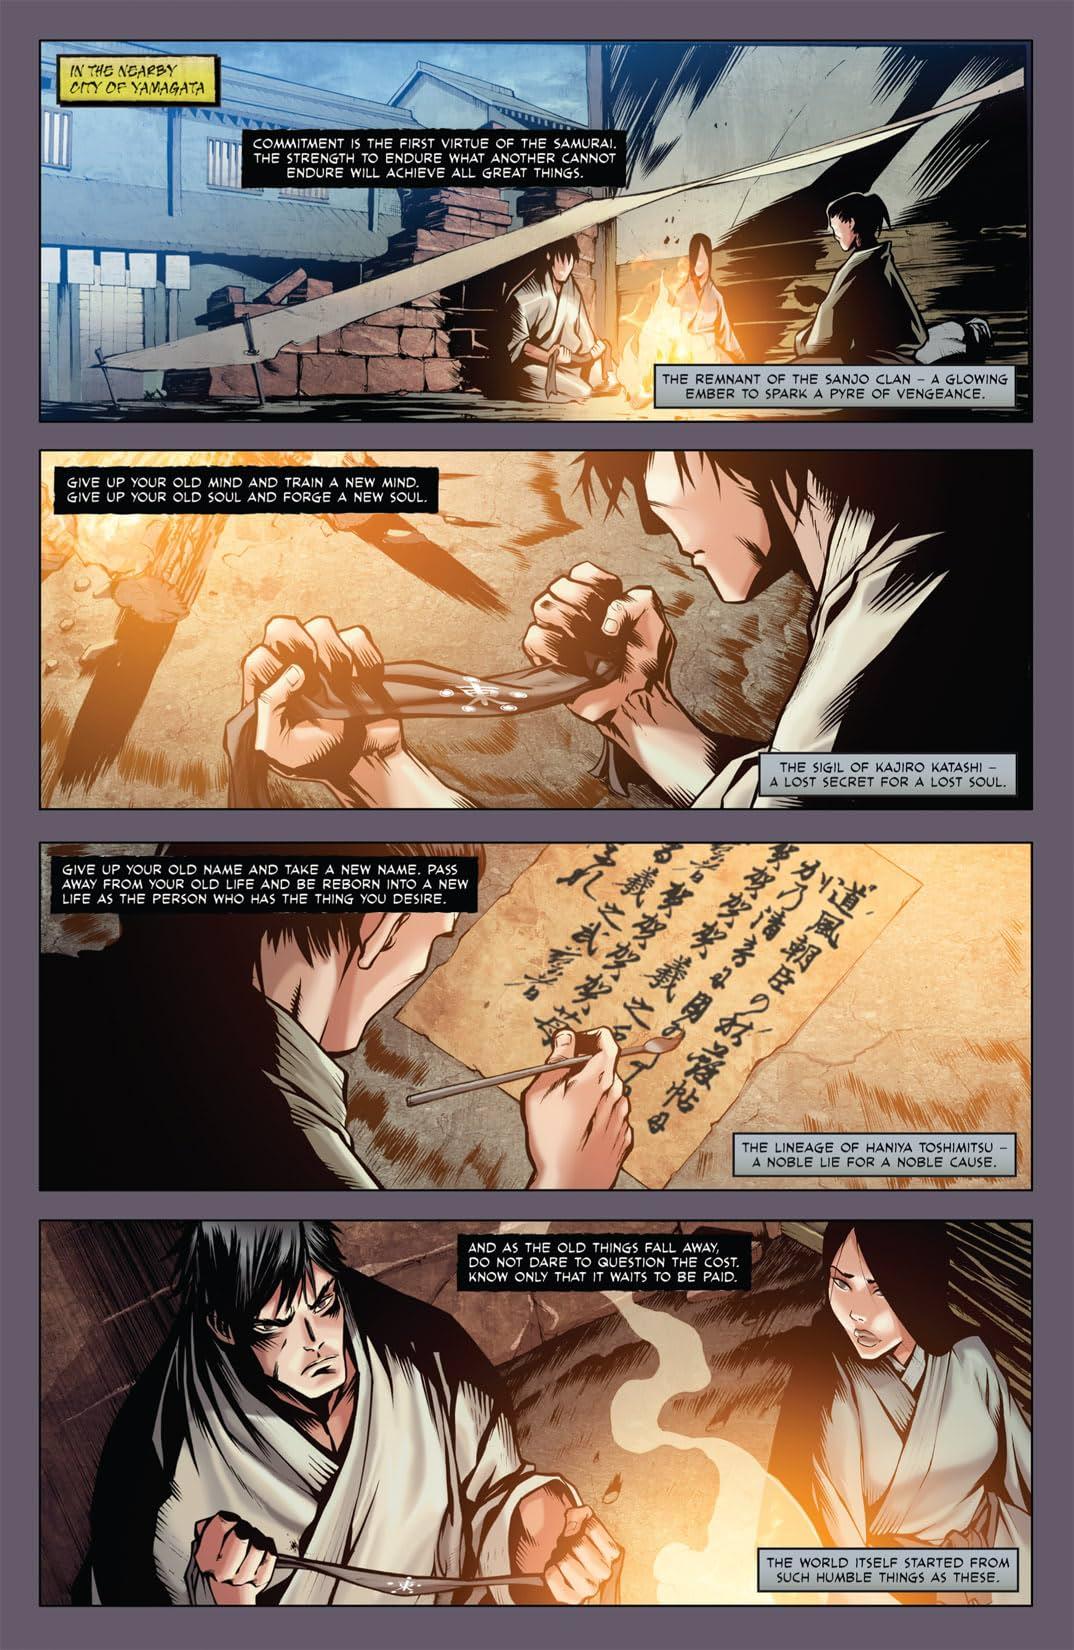 Samurai's Blood #2 (of 6)